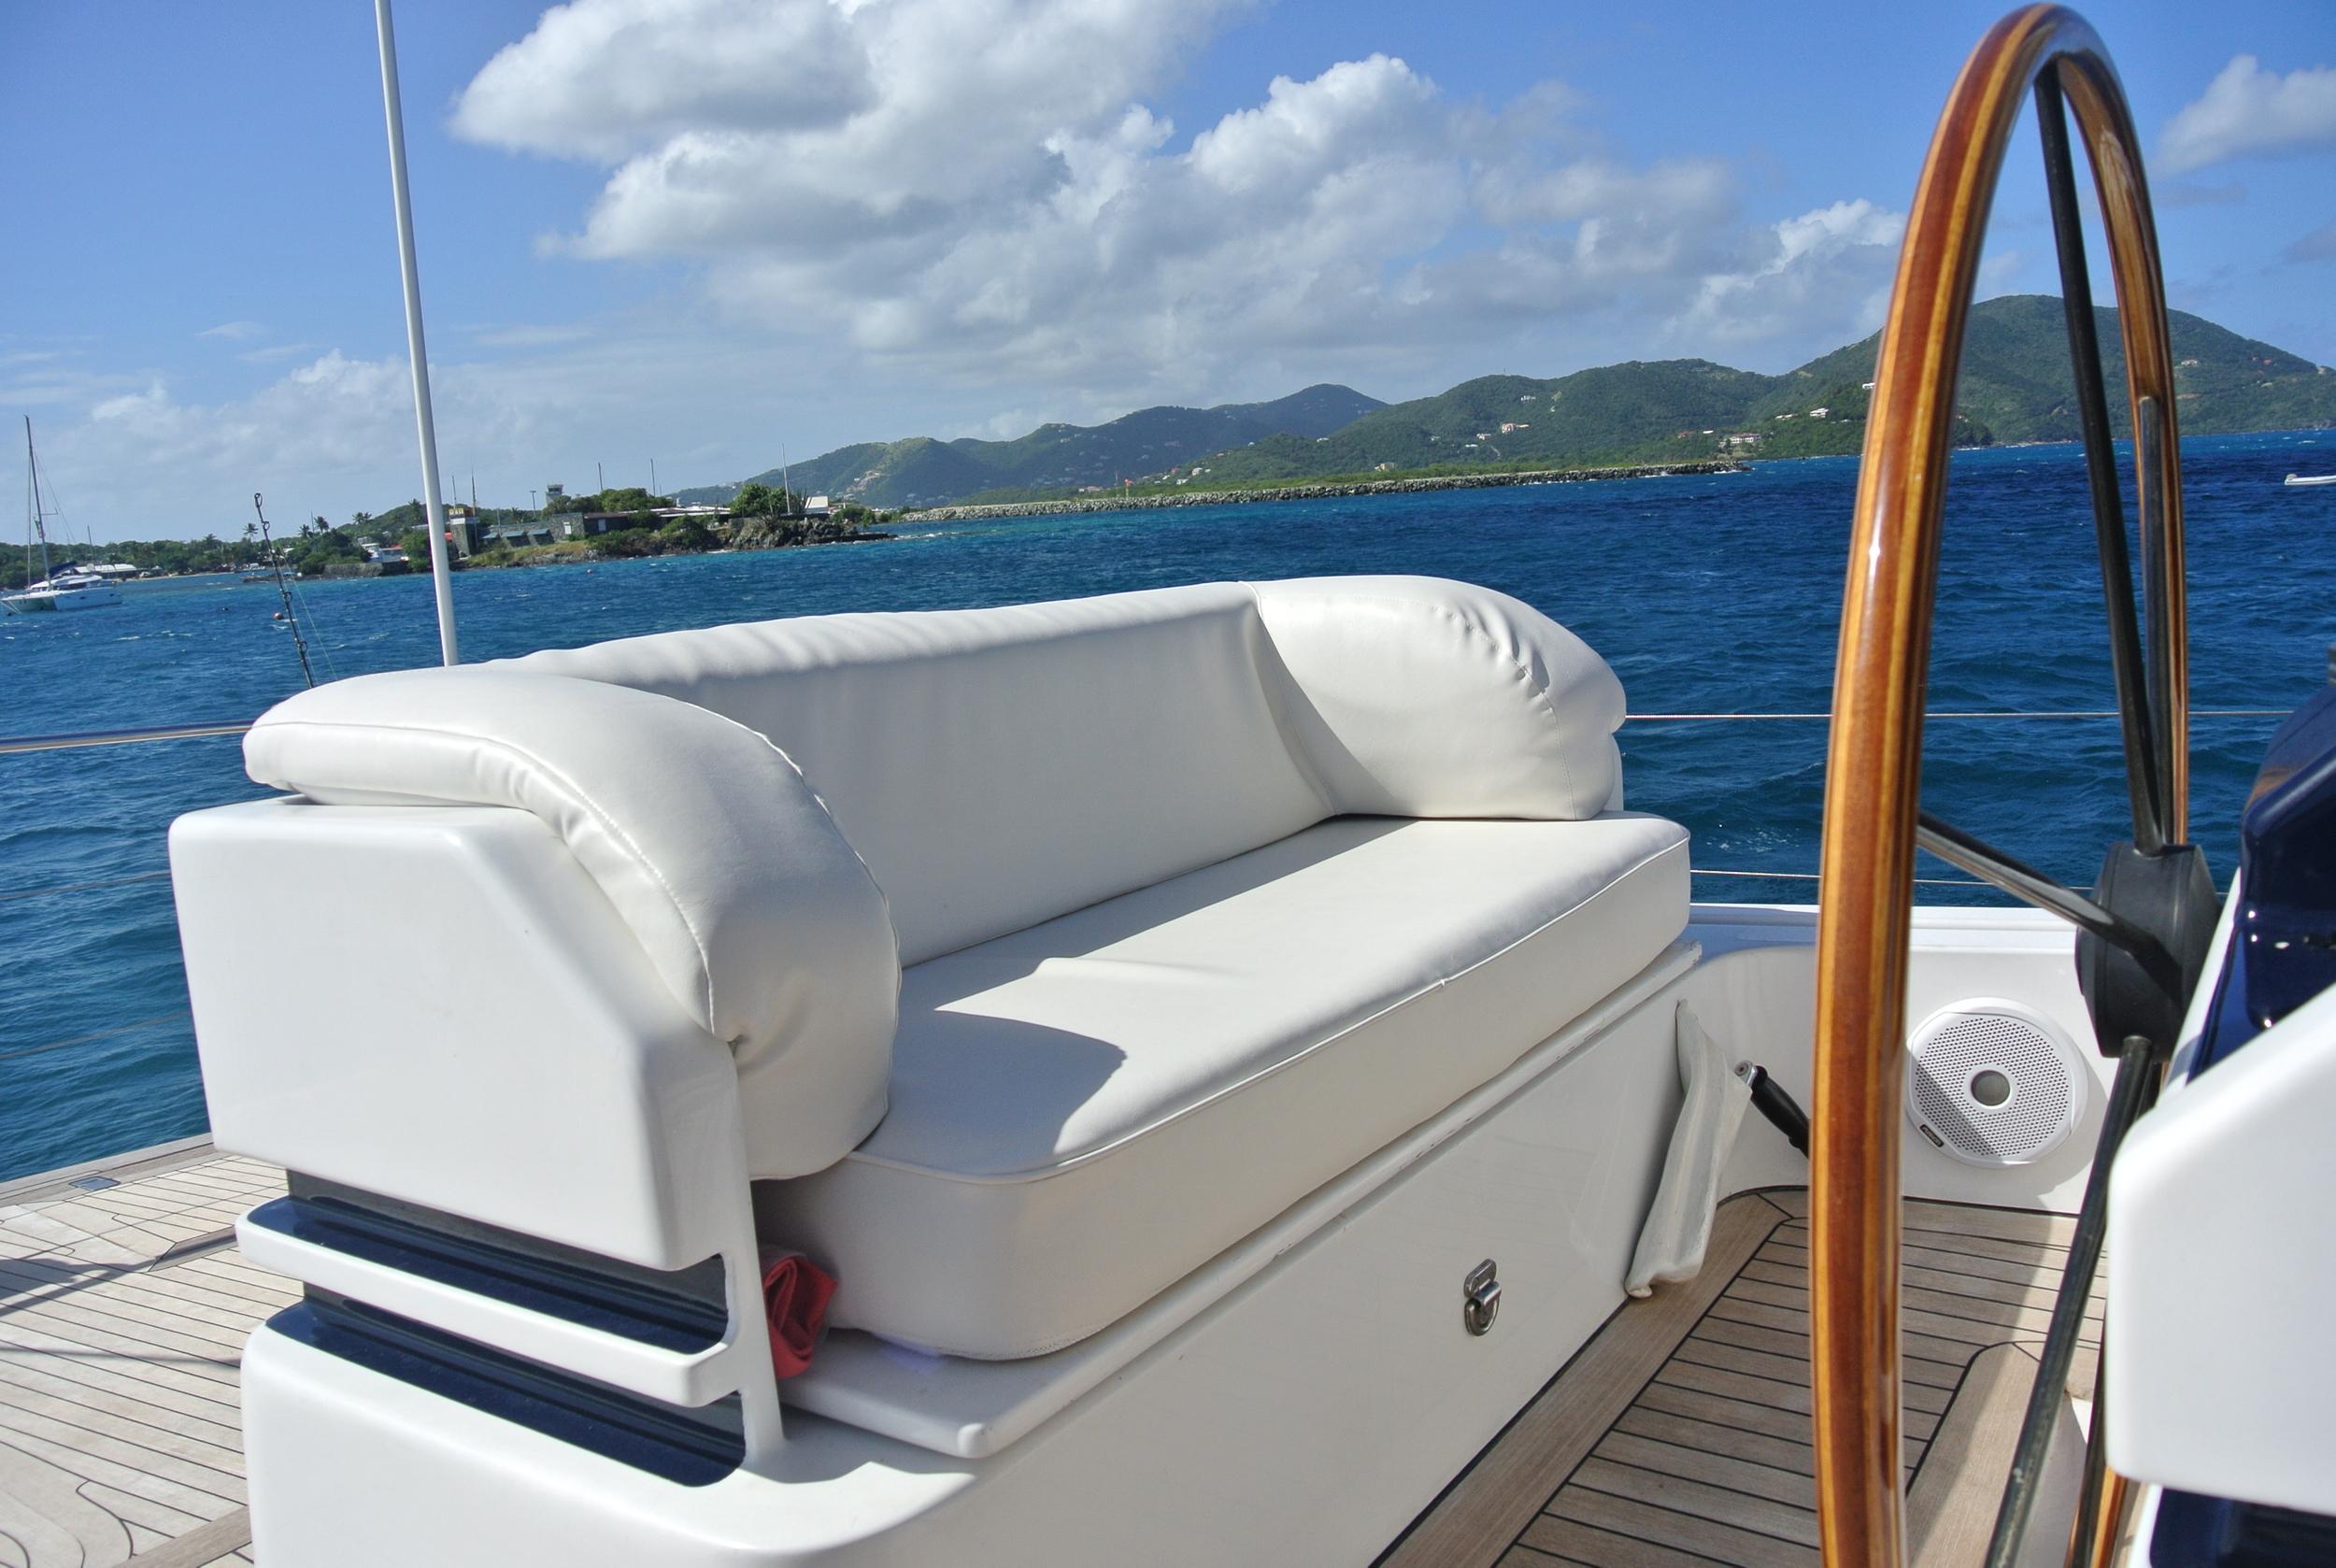 Boat cushions yacht upholstery by Maloney Interiors Rhode Island.JPG